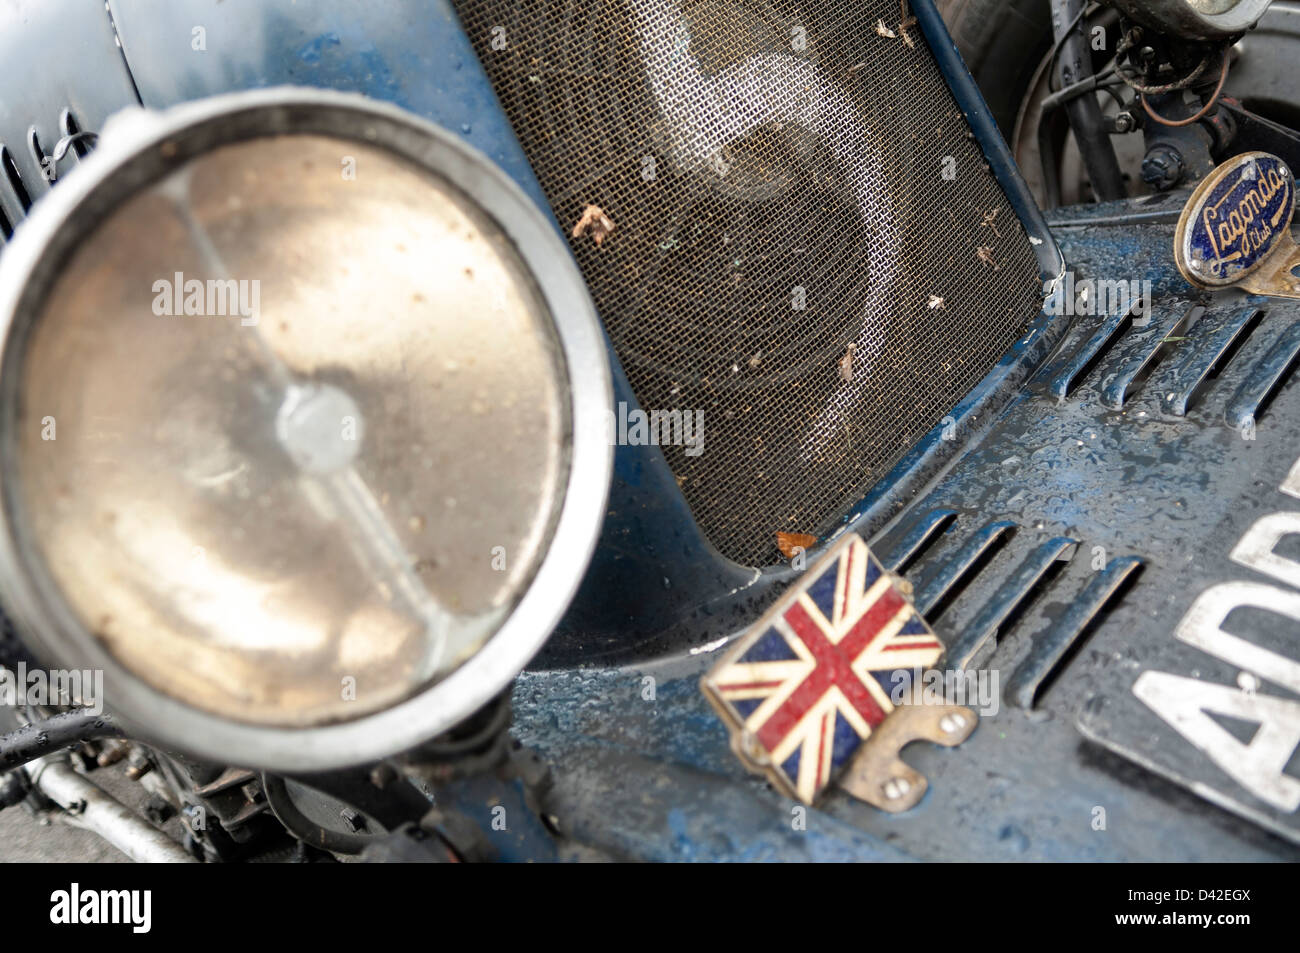 Lagonda Pre war classic car - Stock Image